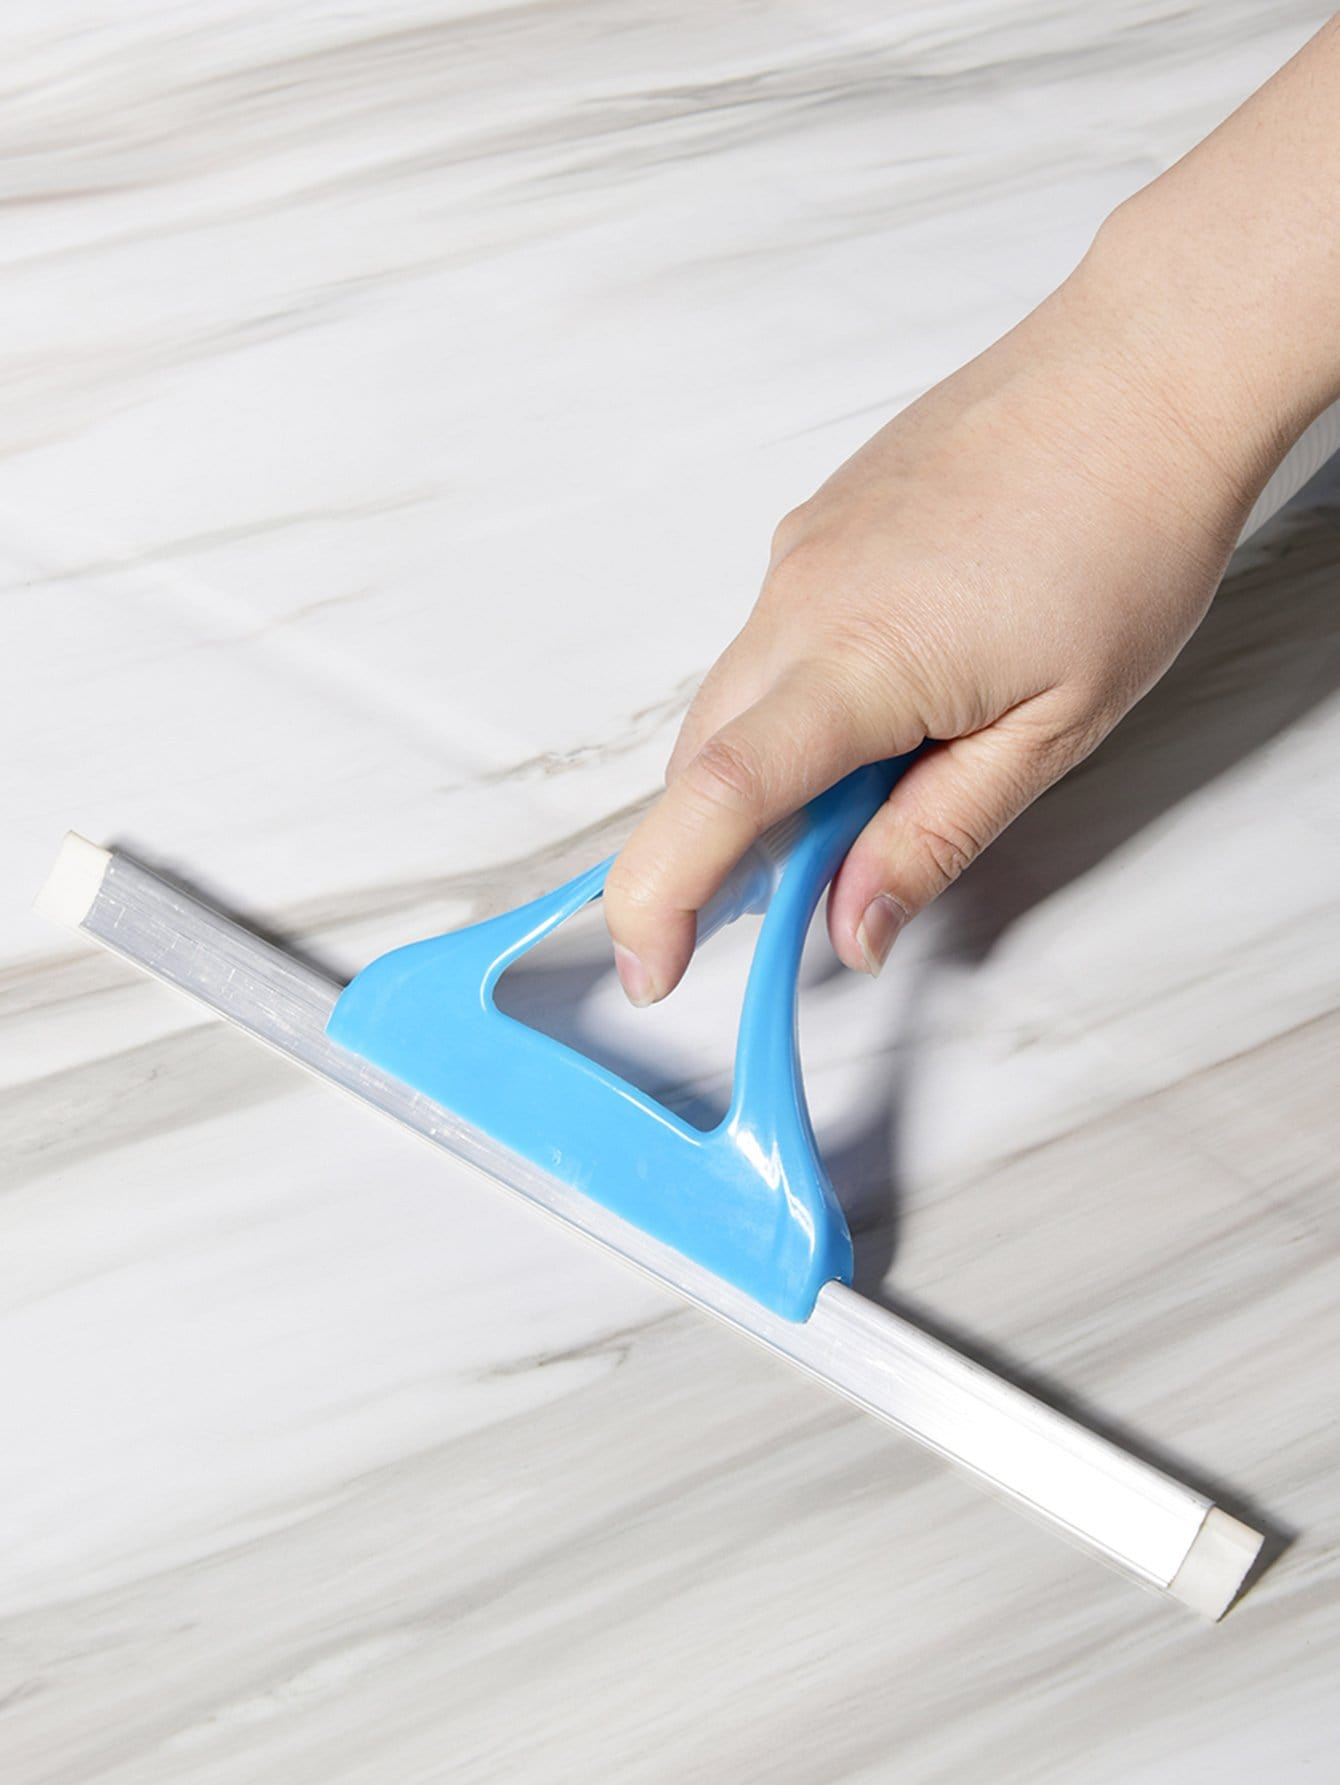 Cleaning Brush With Spray cleaning brush with spray